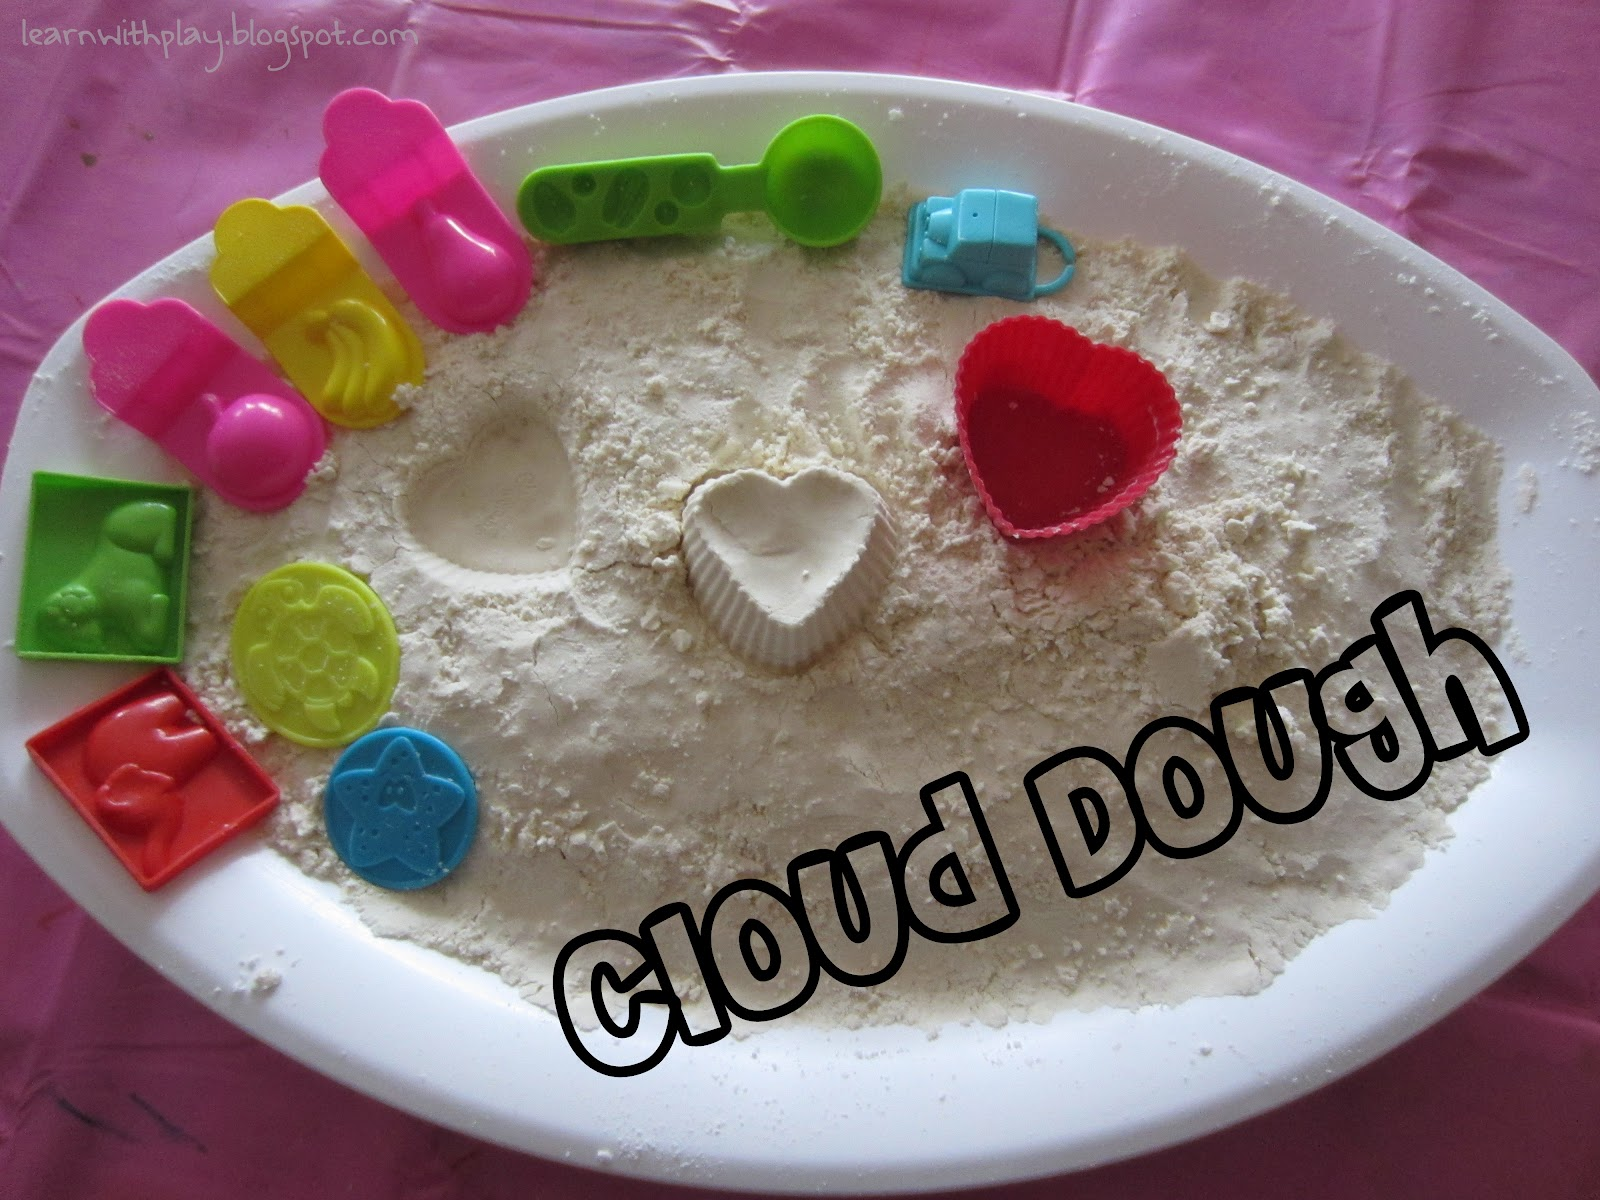 How to make cloud dough at home traducida